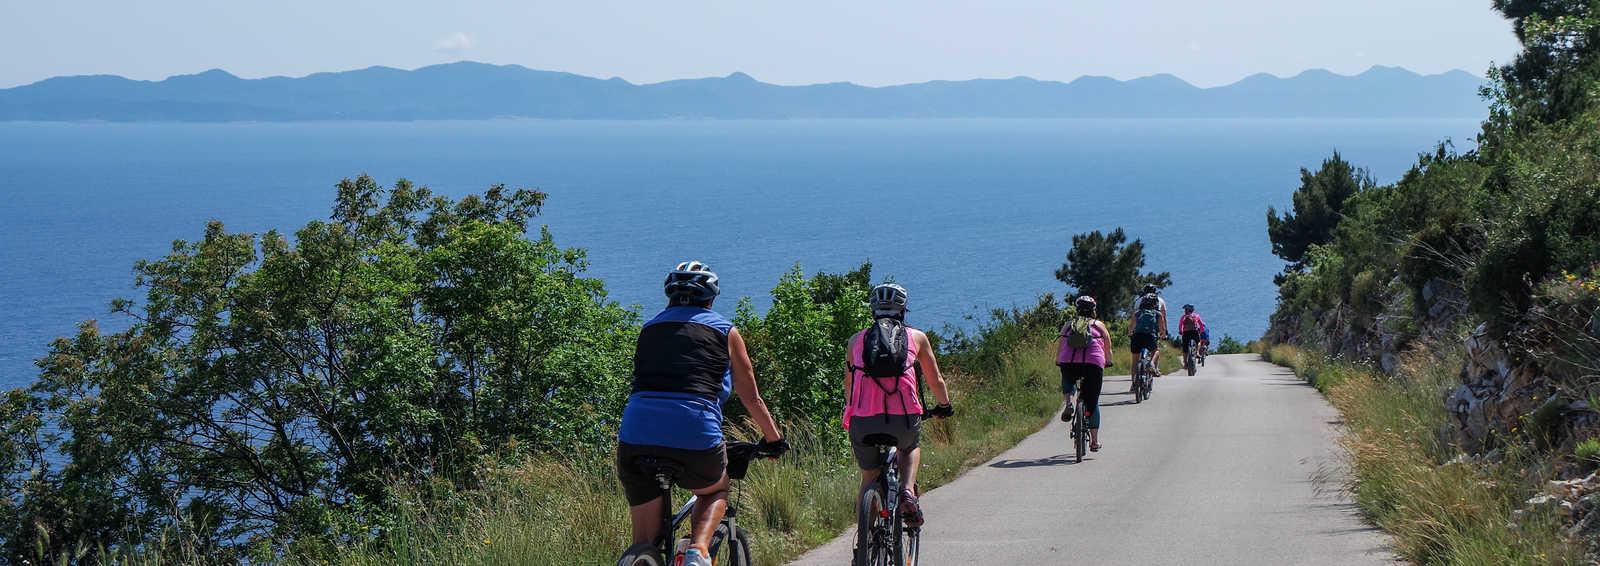 Cycling towards Zuljana, Croatia